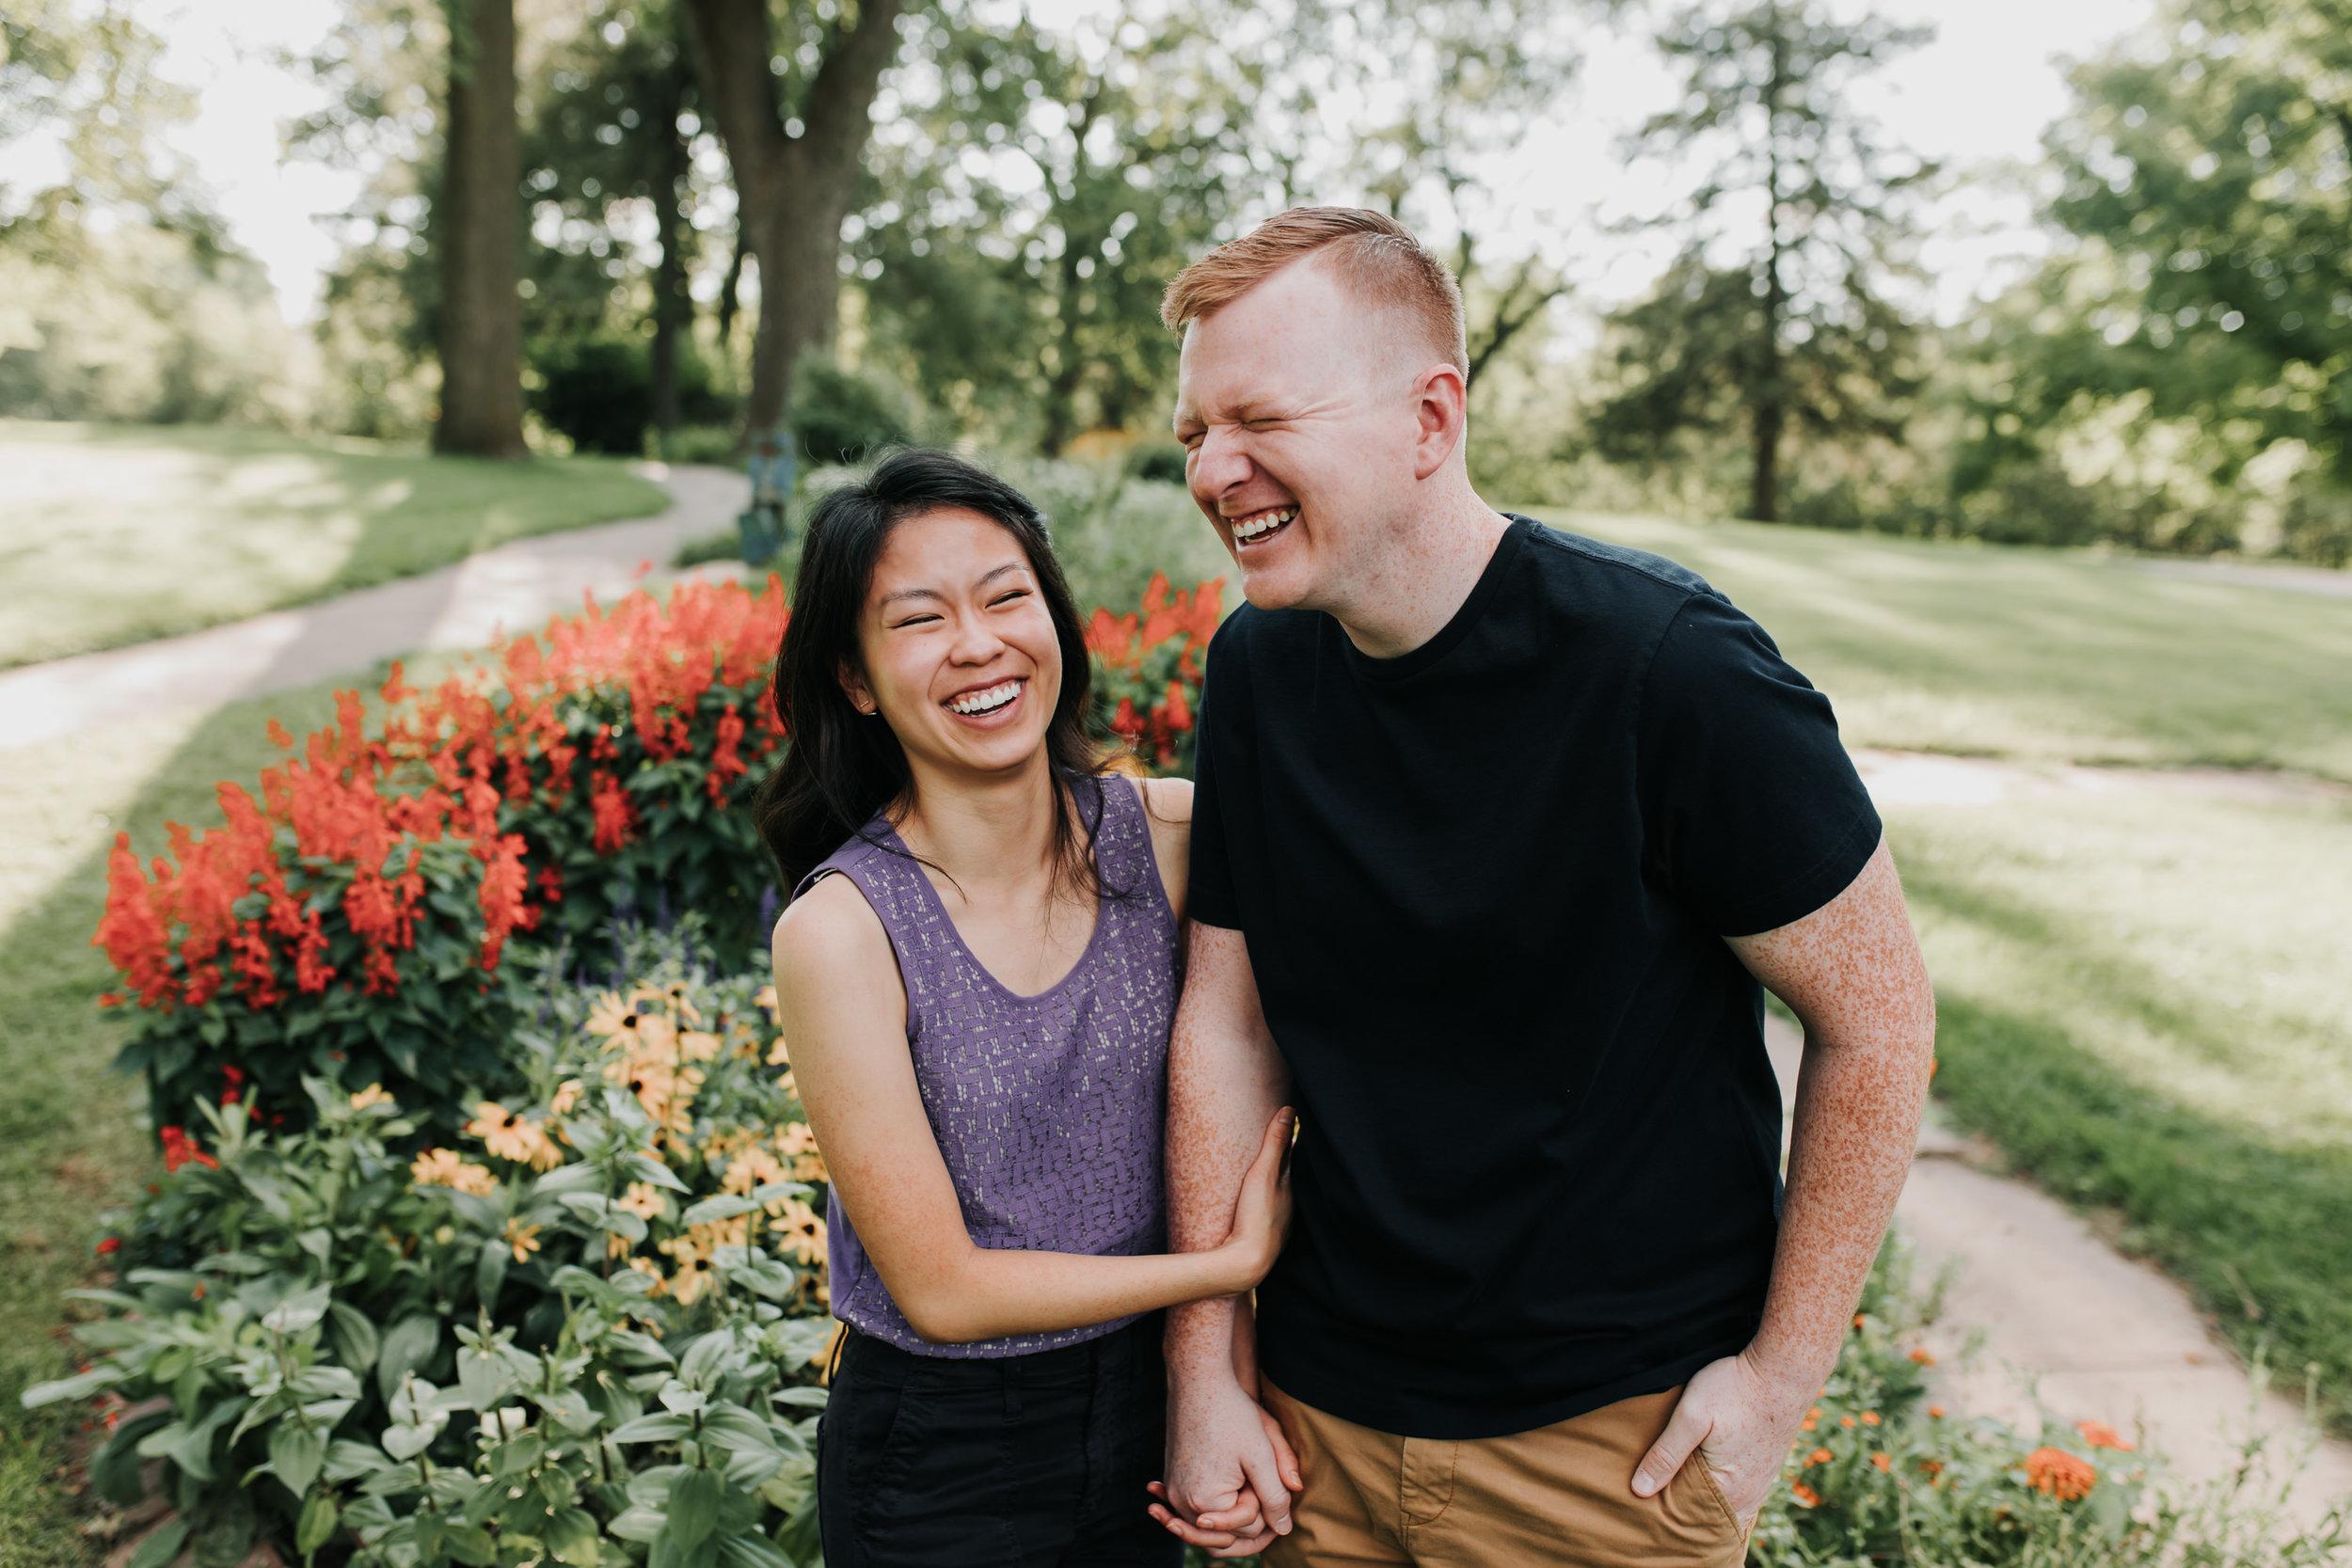 Catherin & Kyle - Married - Nathaniel Jensen Photography - Omaha Nebraska Wedding Photograper - Memorial Park - Joslyn Castle Engagement Session-11.jpg